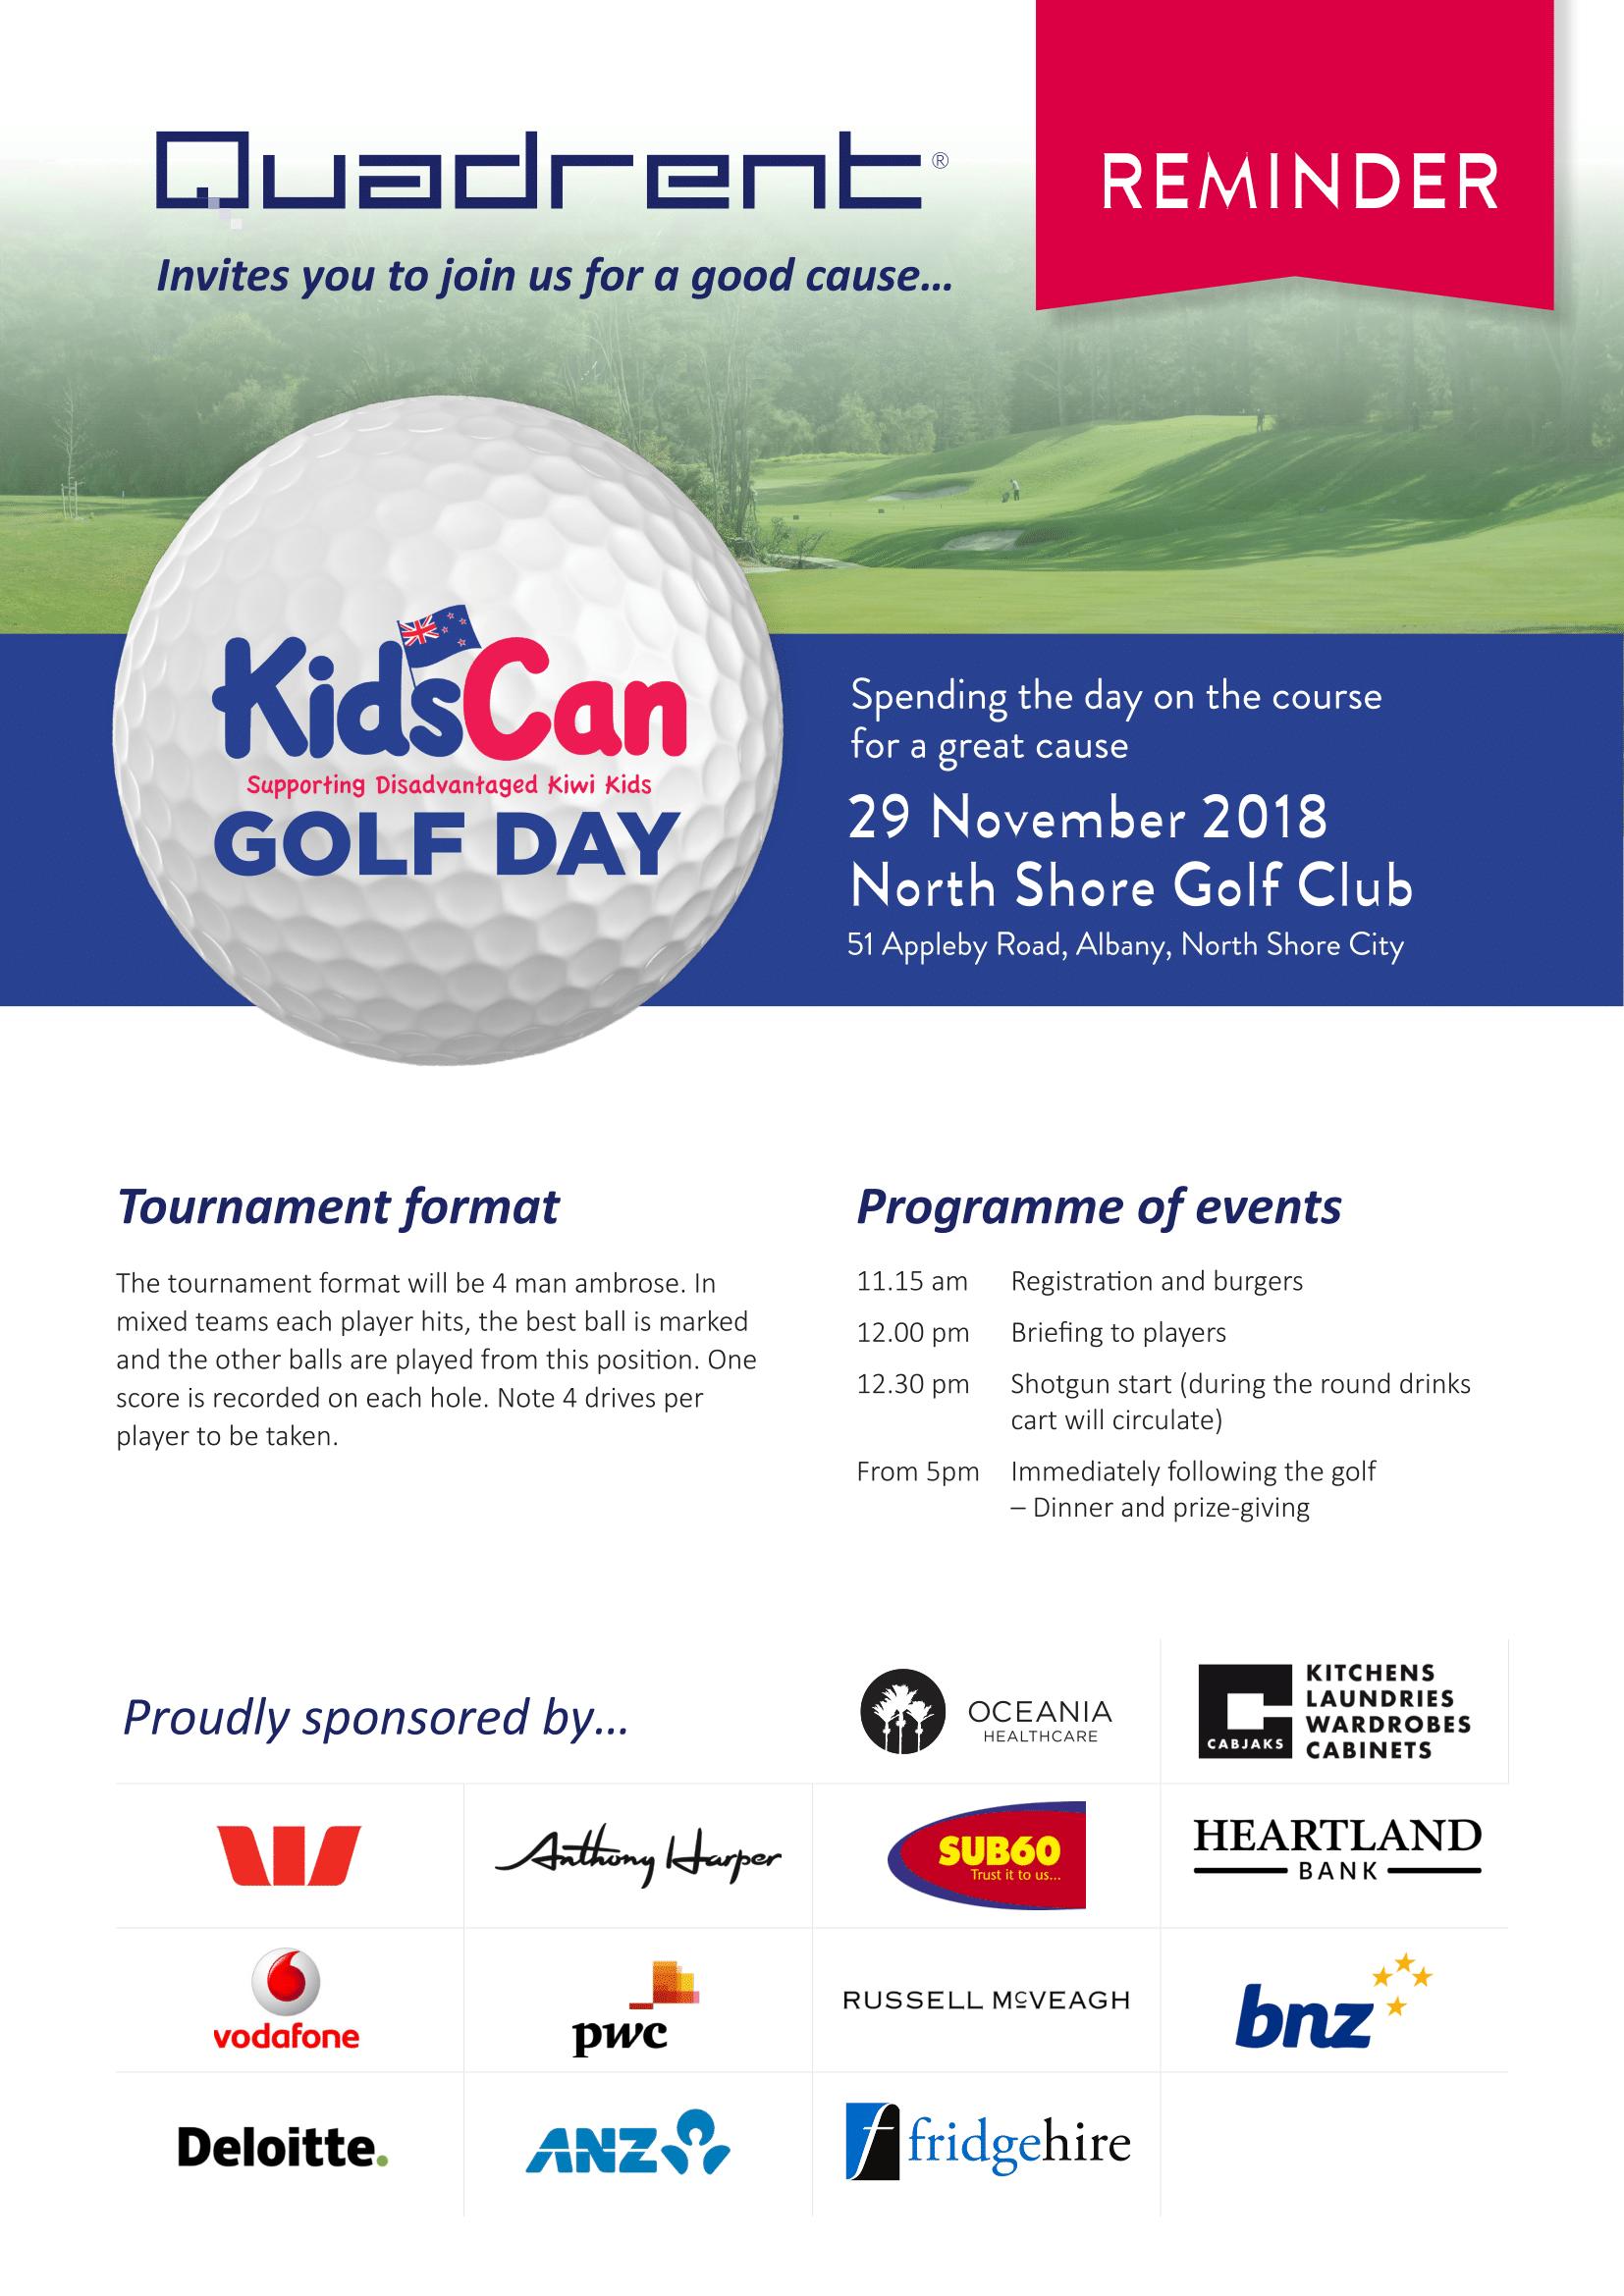 Quadrent Golf day reminder